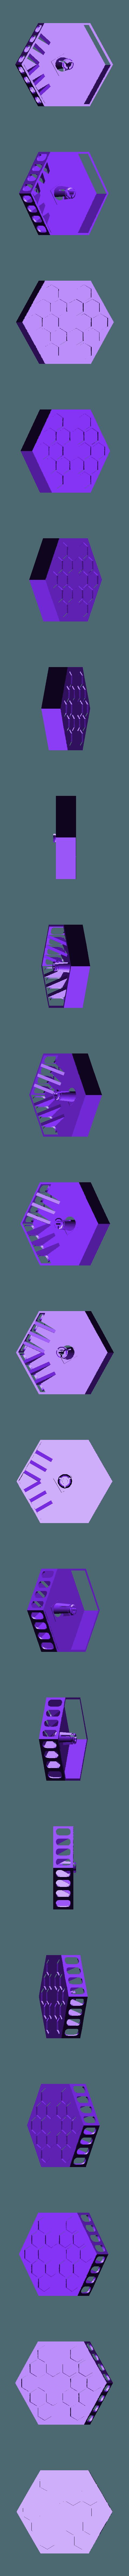 Ender_3_Tool-less_Fan_Guard.stl Download free STL file Ender 3 Tool-less Mainboard Fan Guard • 3D printable design, FedorSosnin